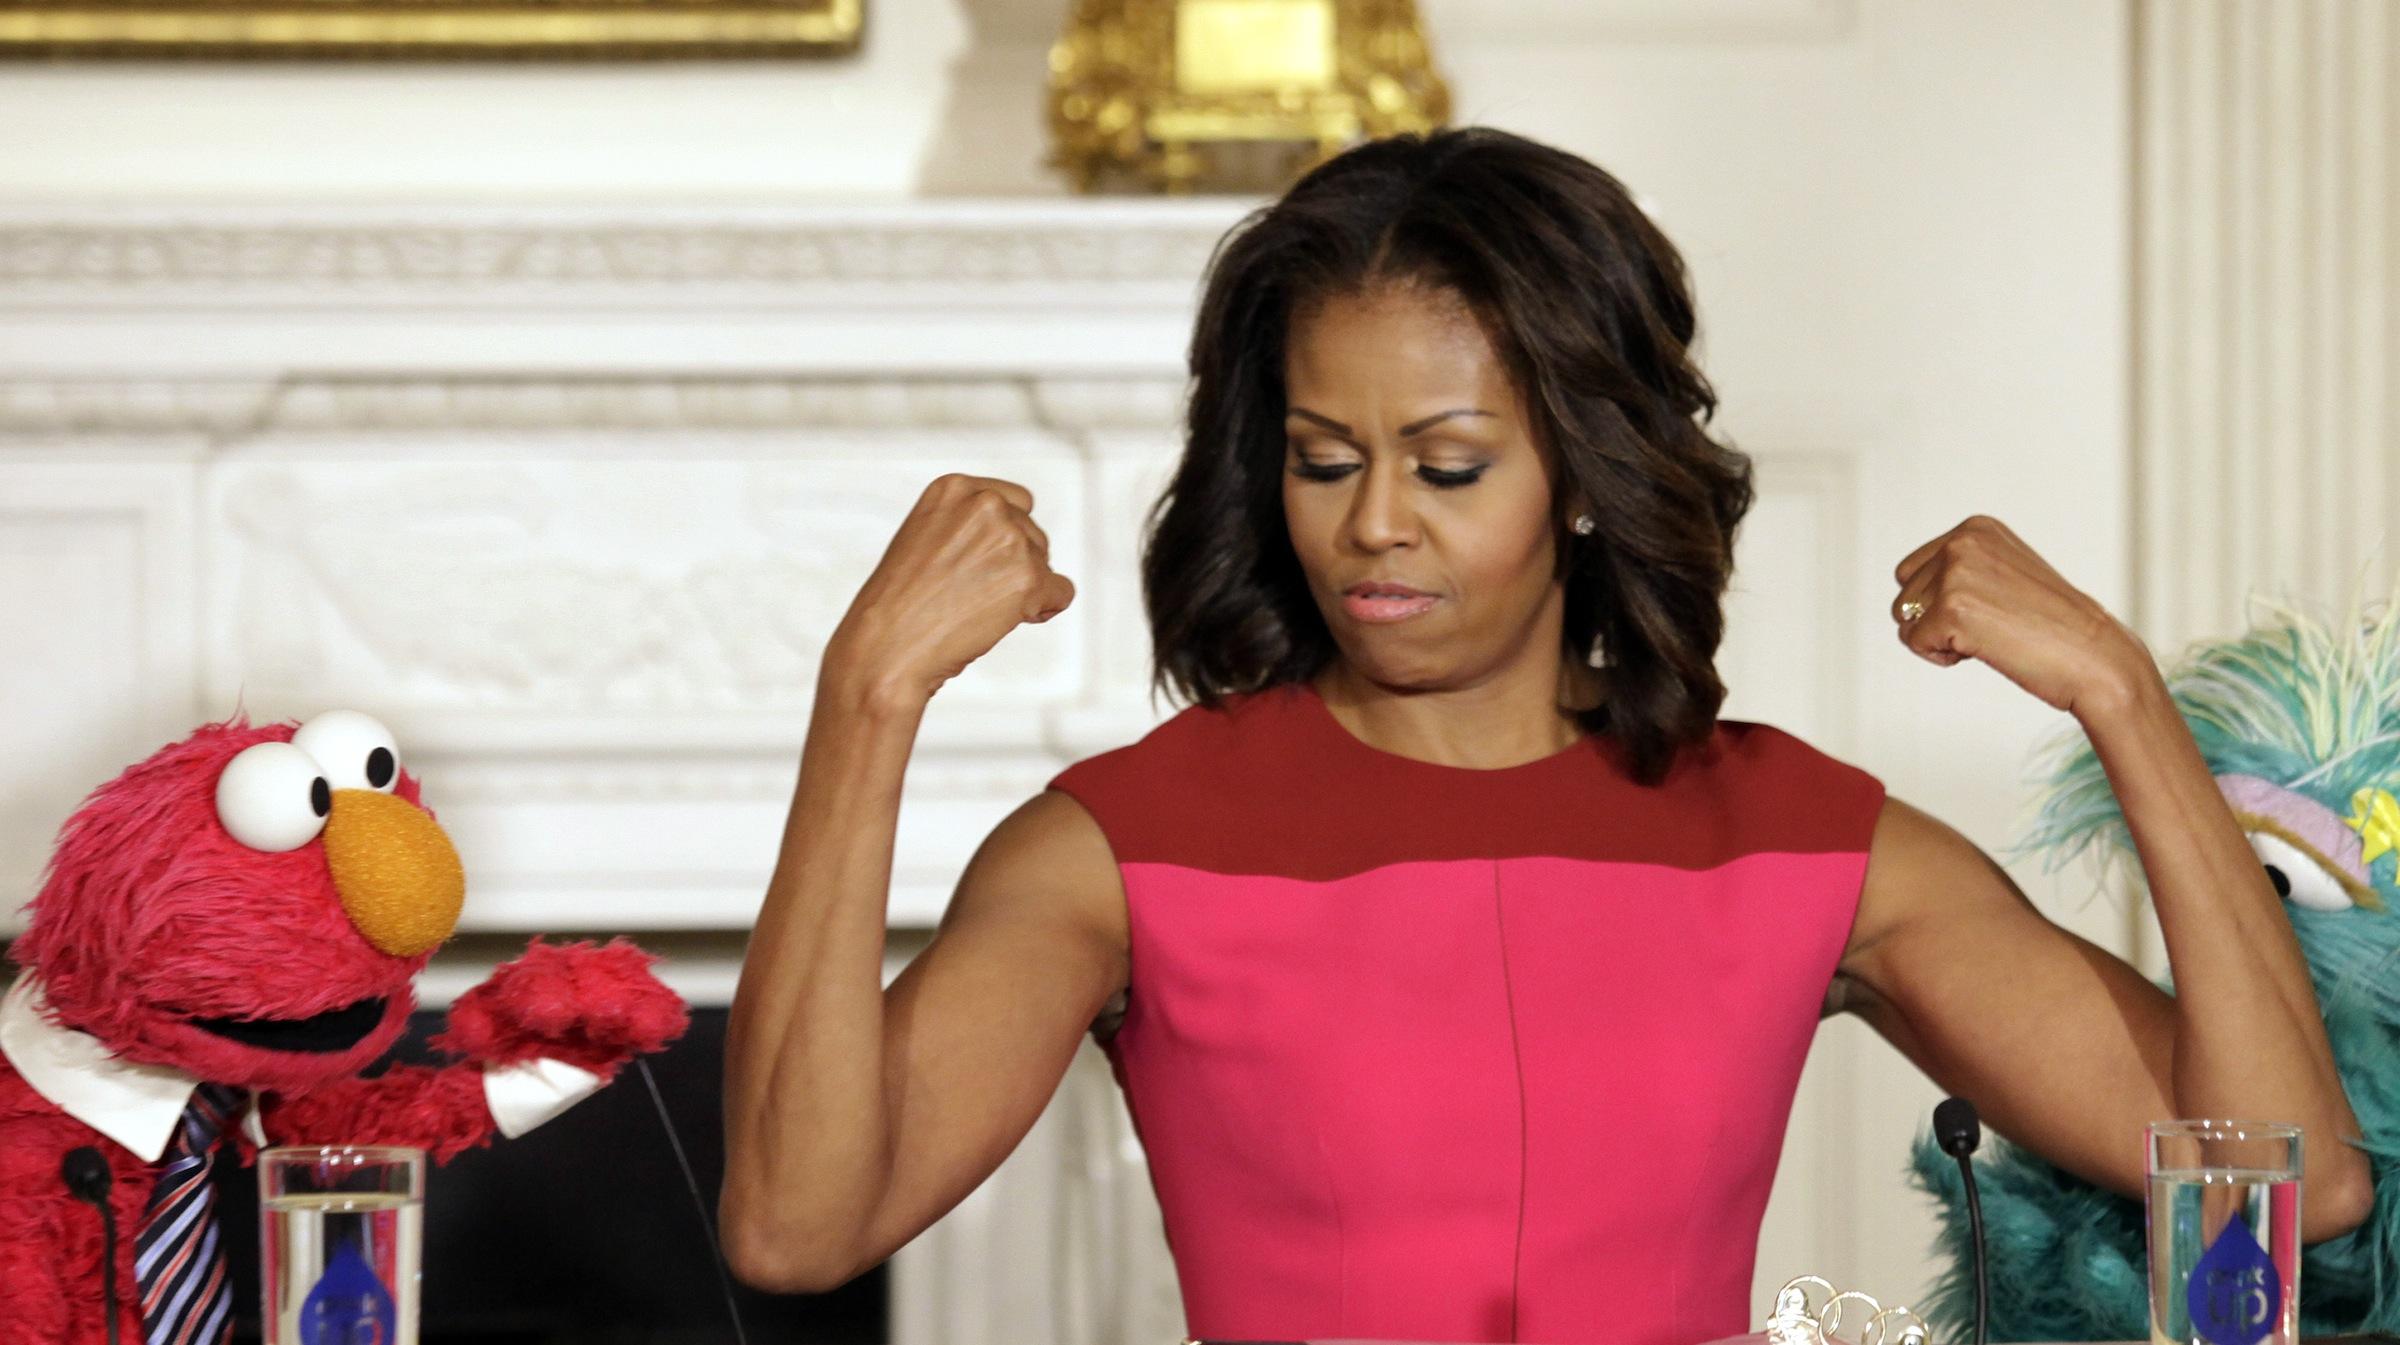 Michelle Obama muppet